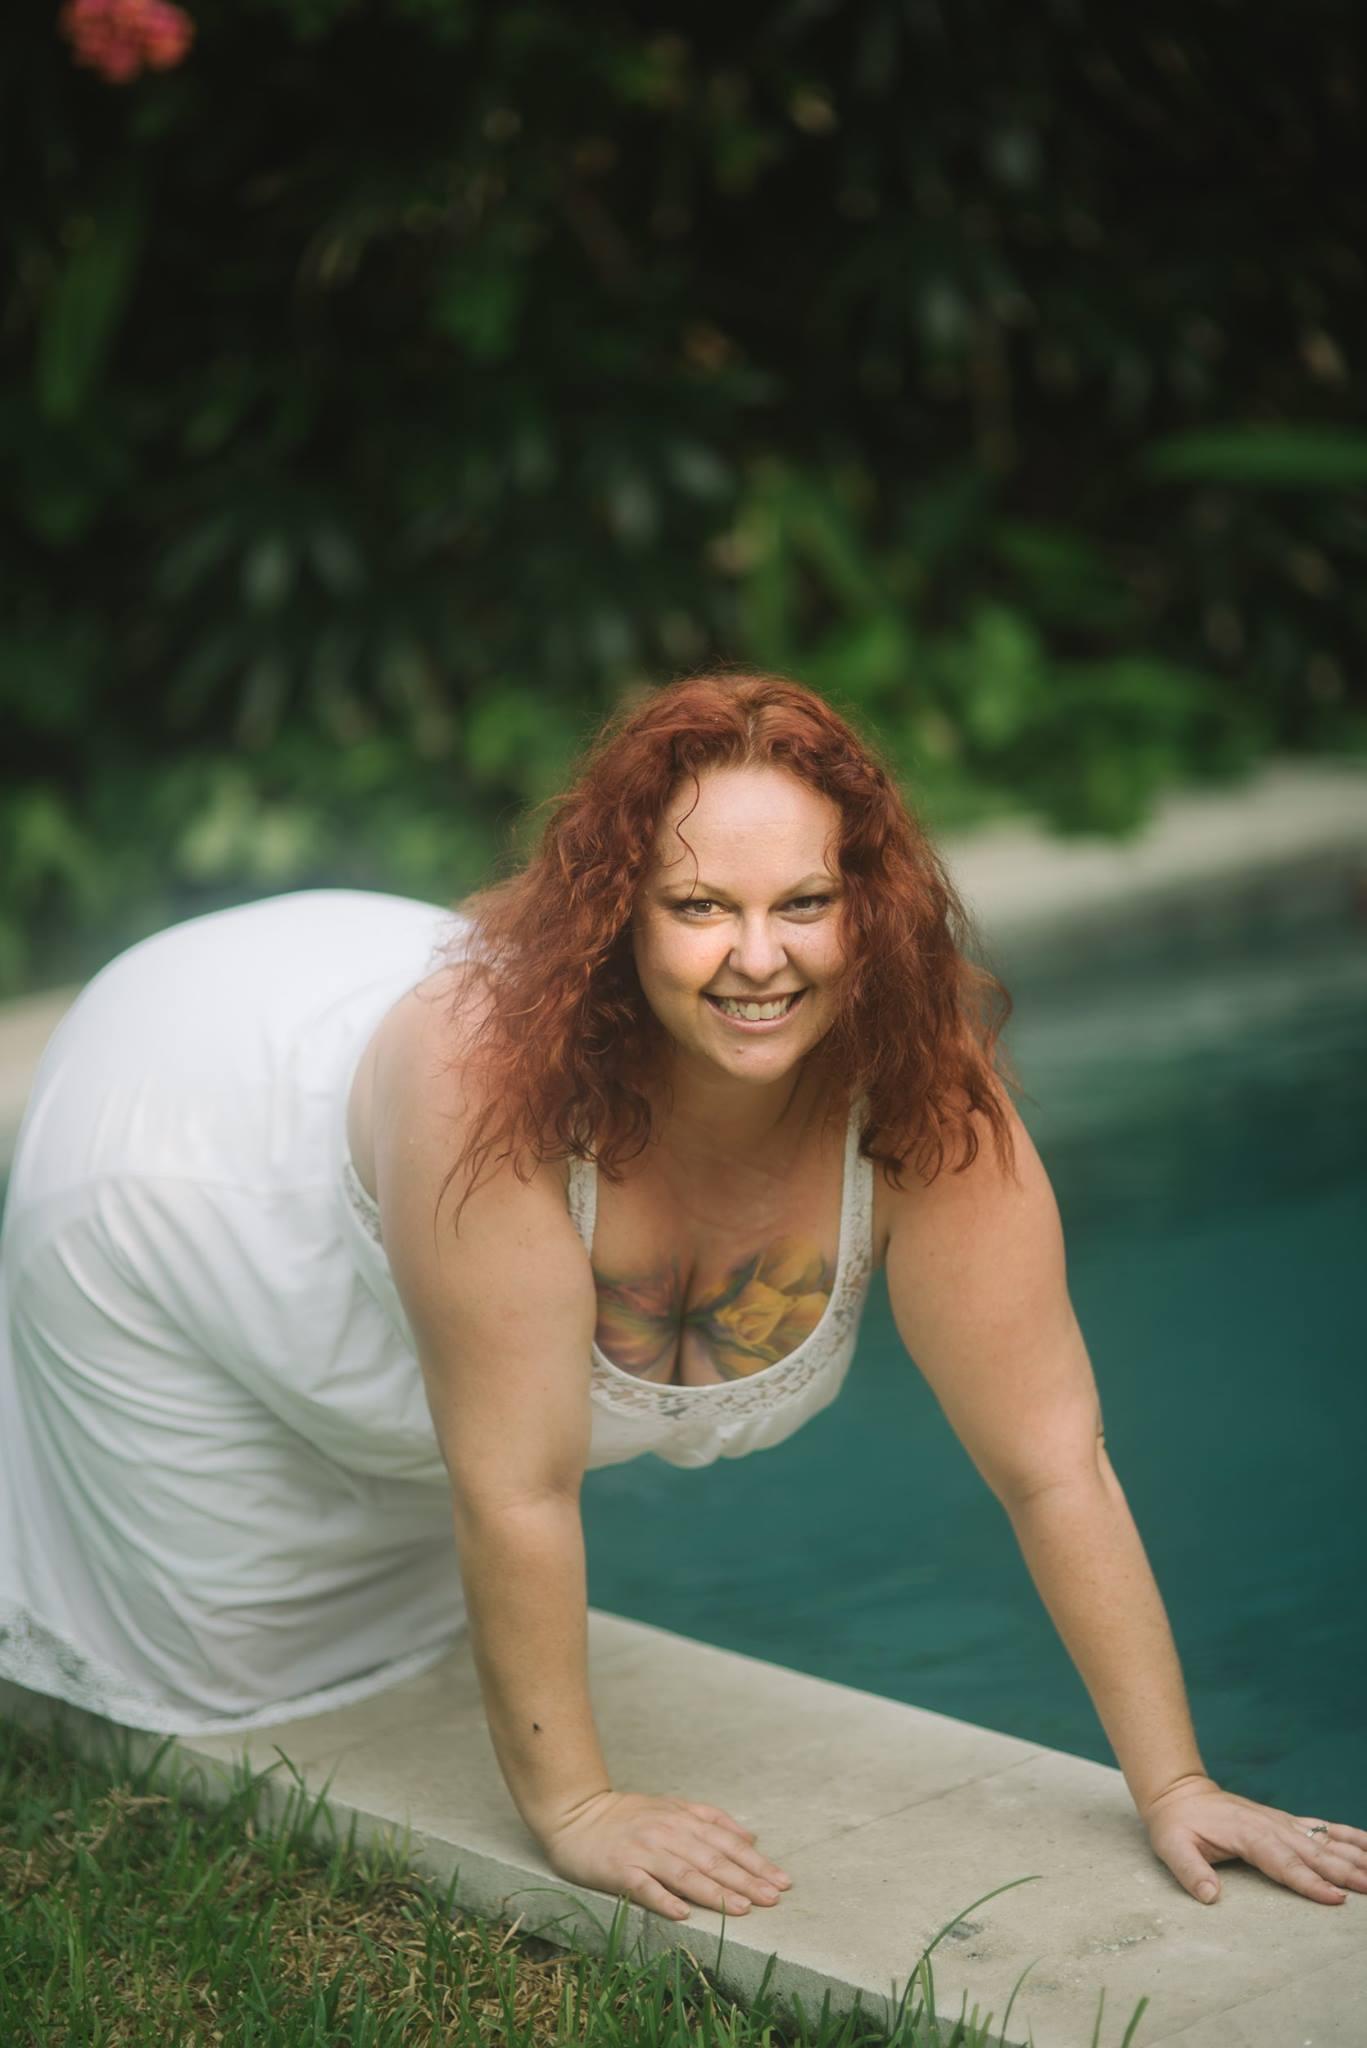 Nikki Ivana, BBW Escort, Las Vegas Escort, GFE, Fetish, 702.236.1975, 702-236-1975, 7022361975